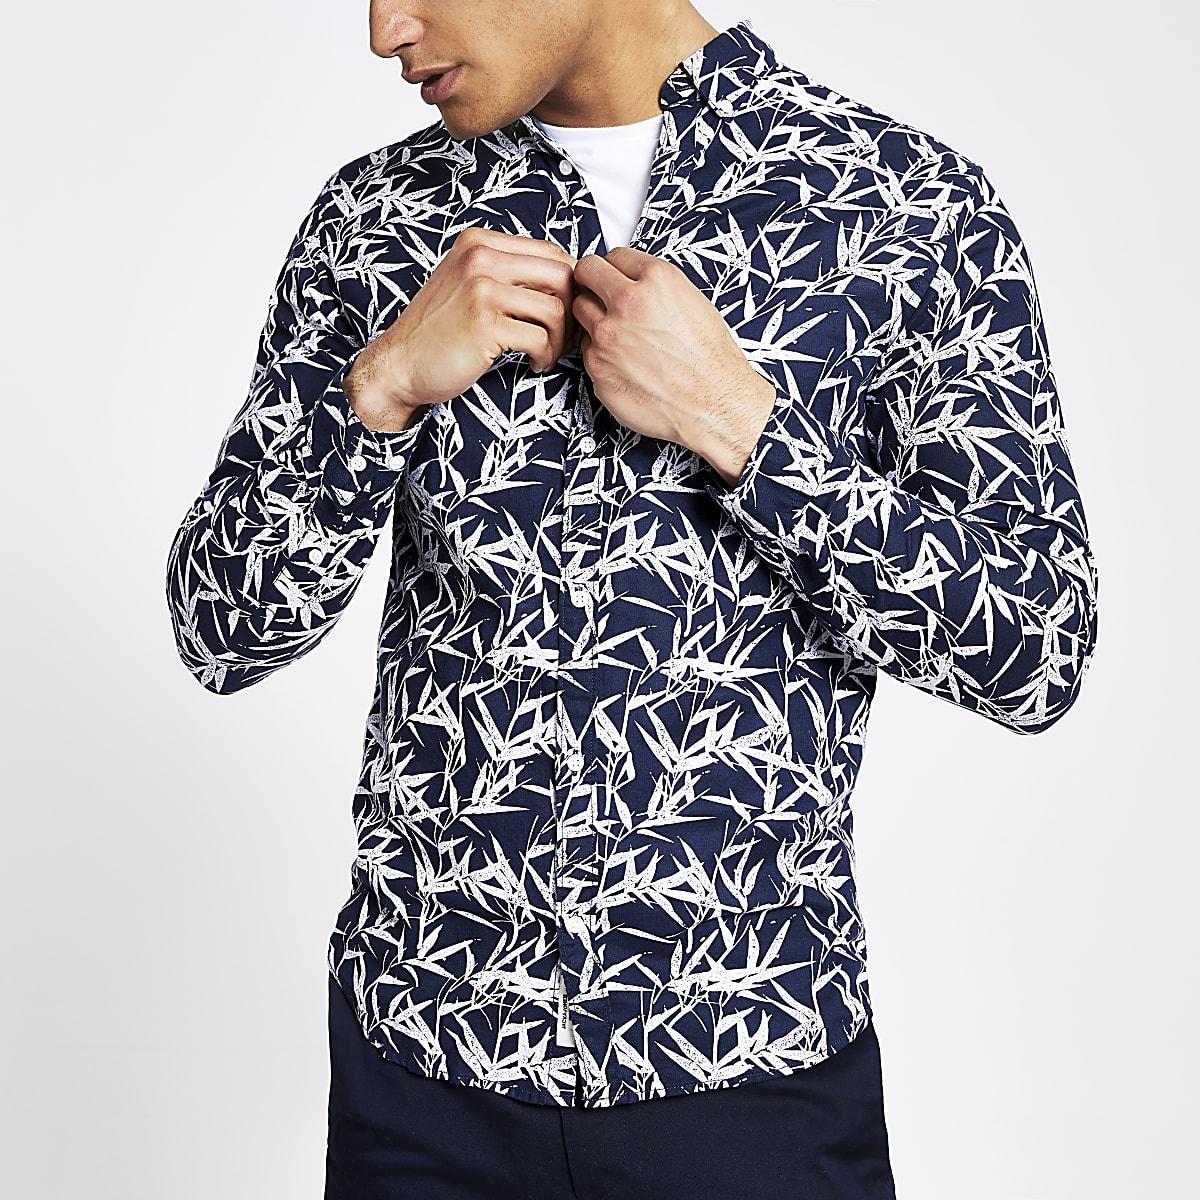 Jack and Jones navy leaf print slim fit shirt